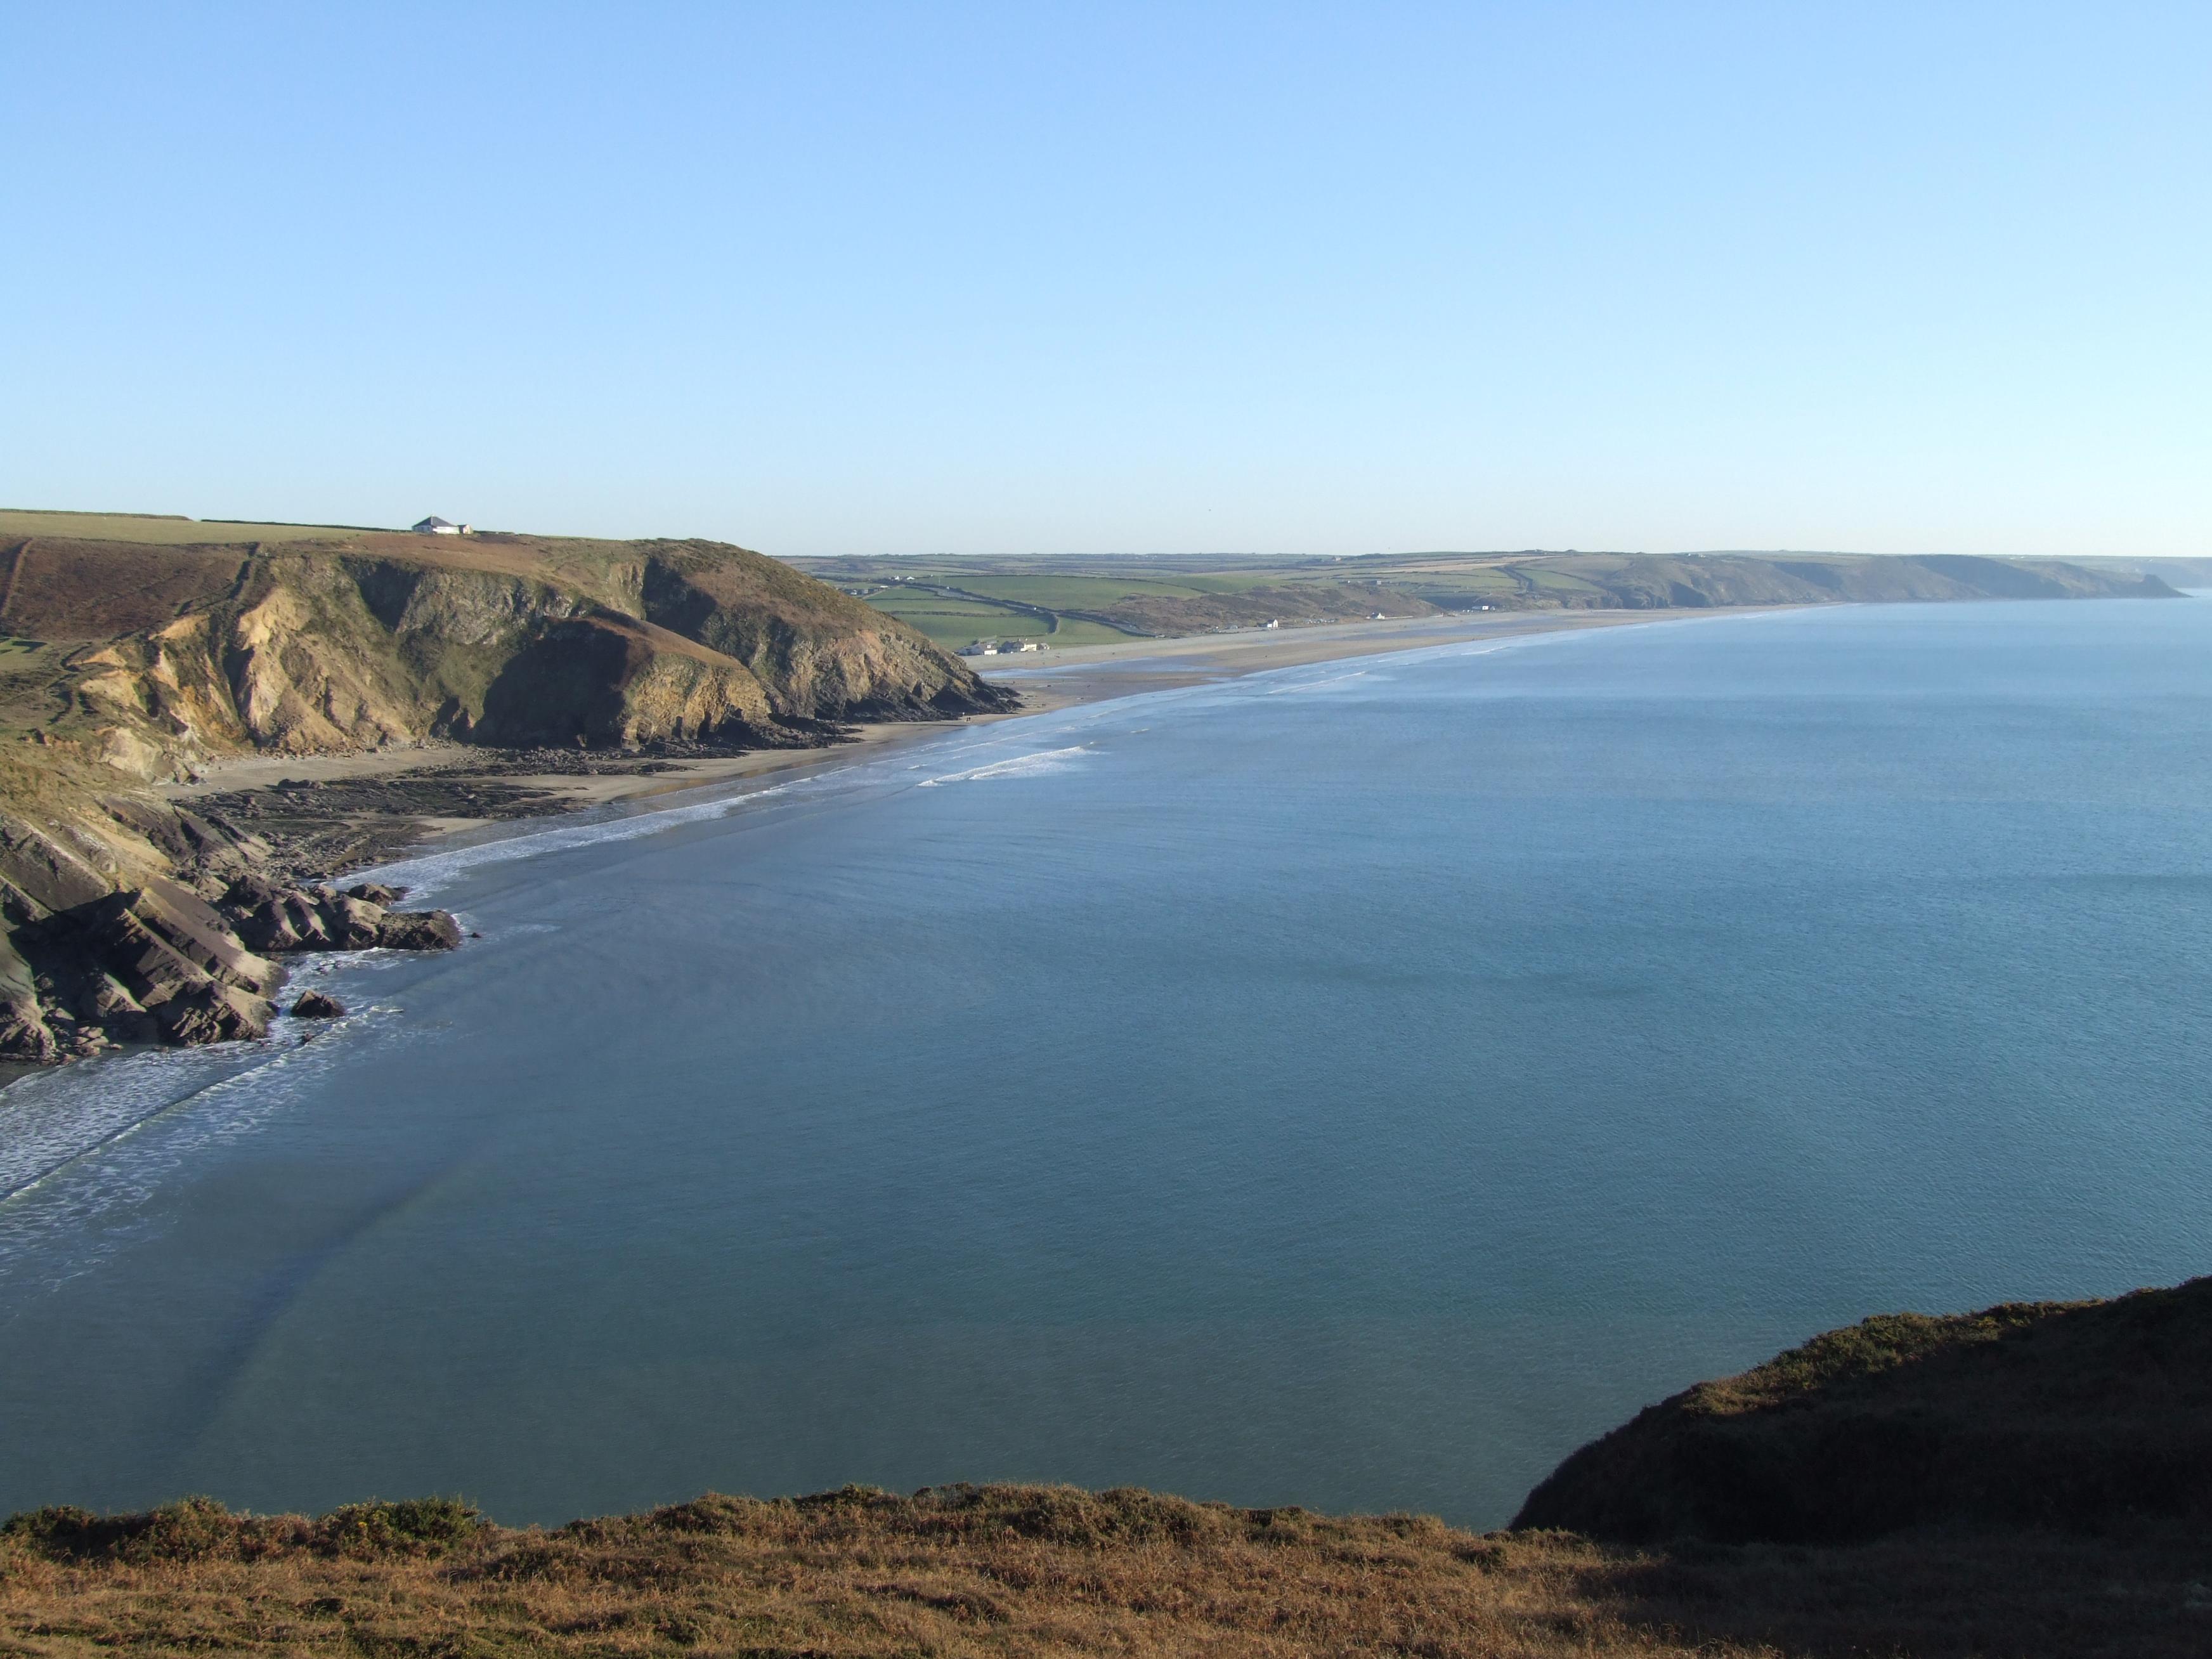 Newgale beach on the Pembrokeshire Coastal Path